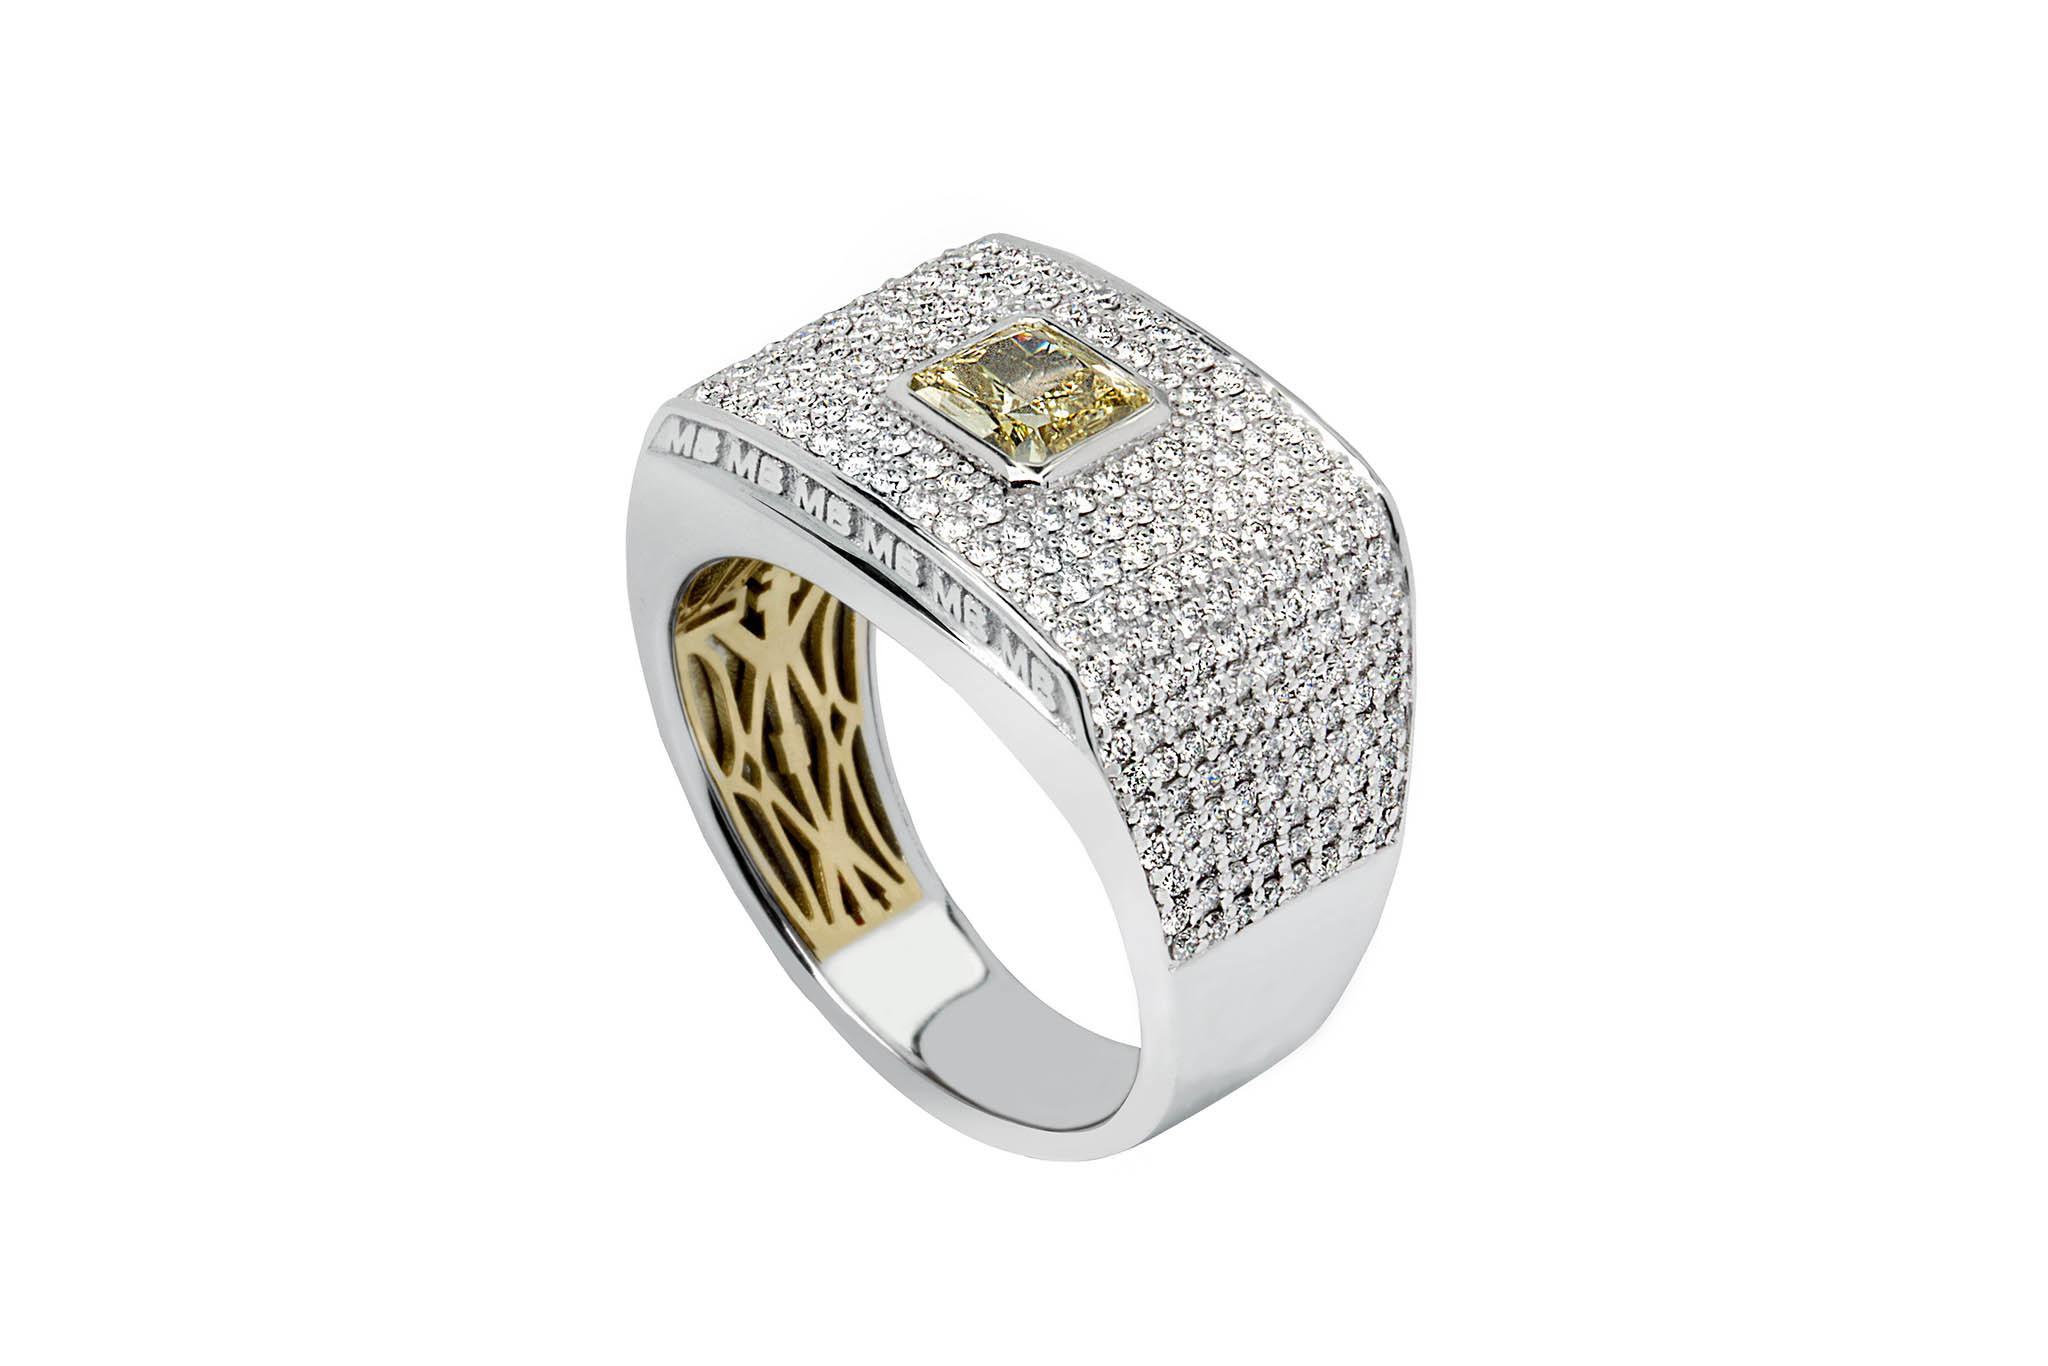 Wedding Rings for Him | Kalfin